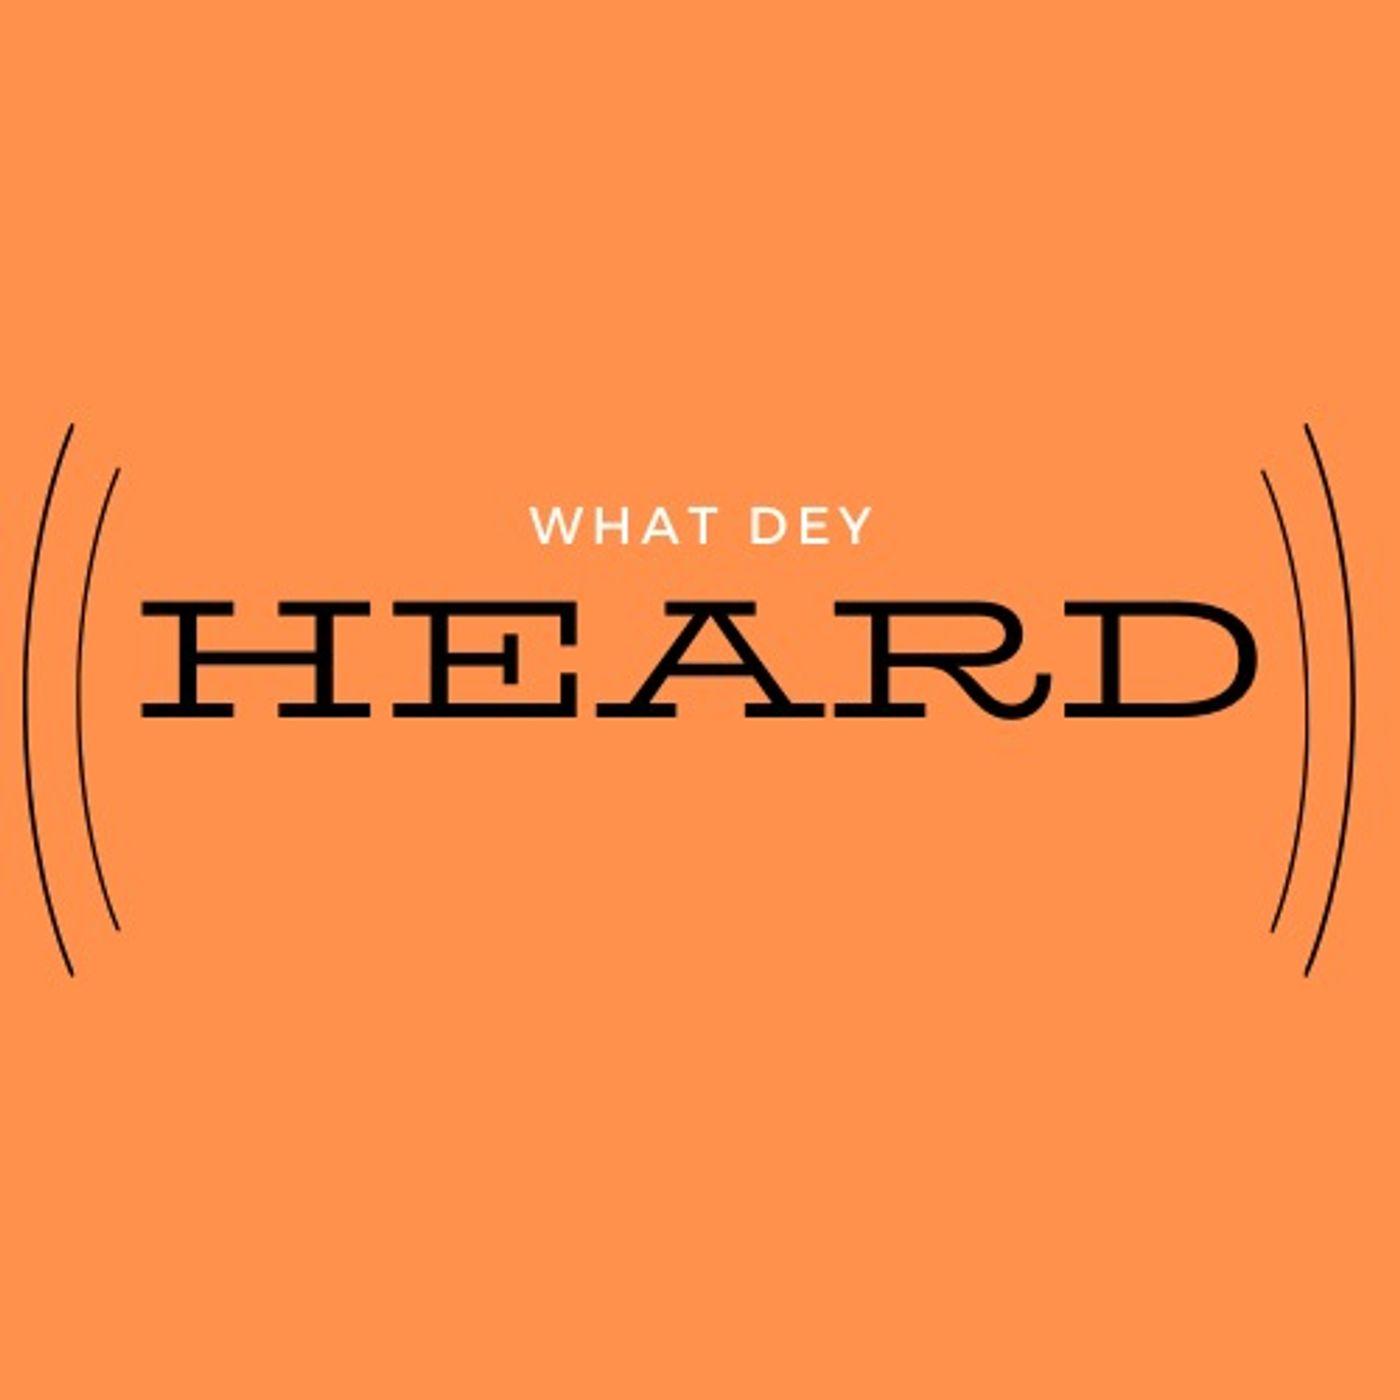 What Dey Heard